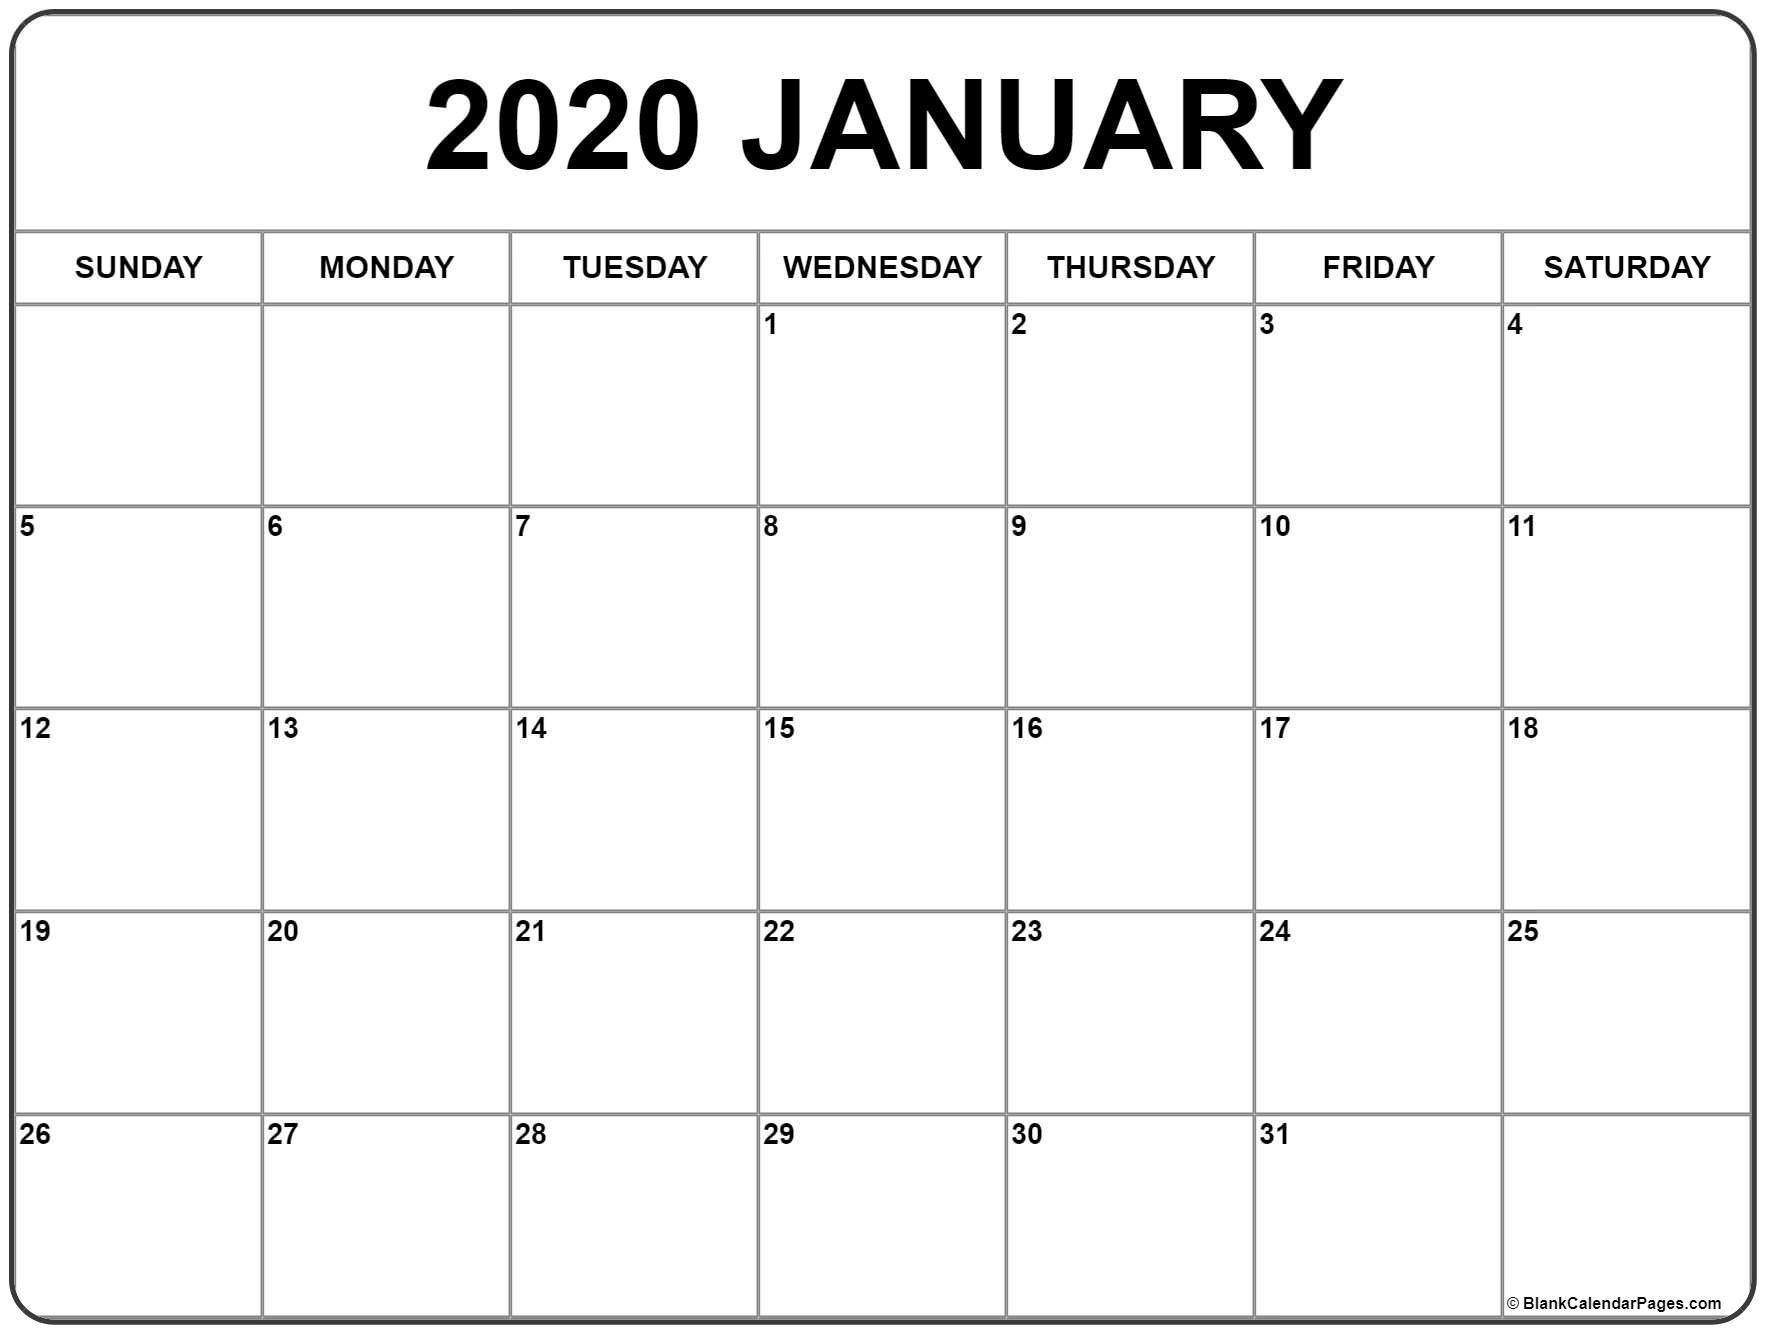 January 2020 Calendar | Free Printable Monthly Calendars  2020 Full Size Calendar Free Printable